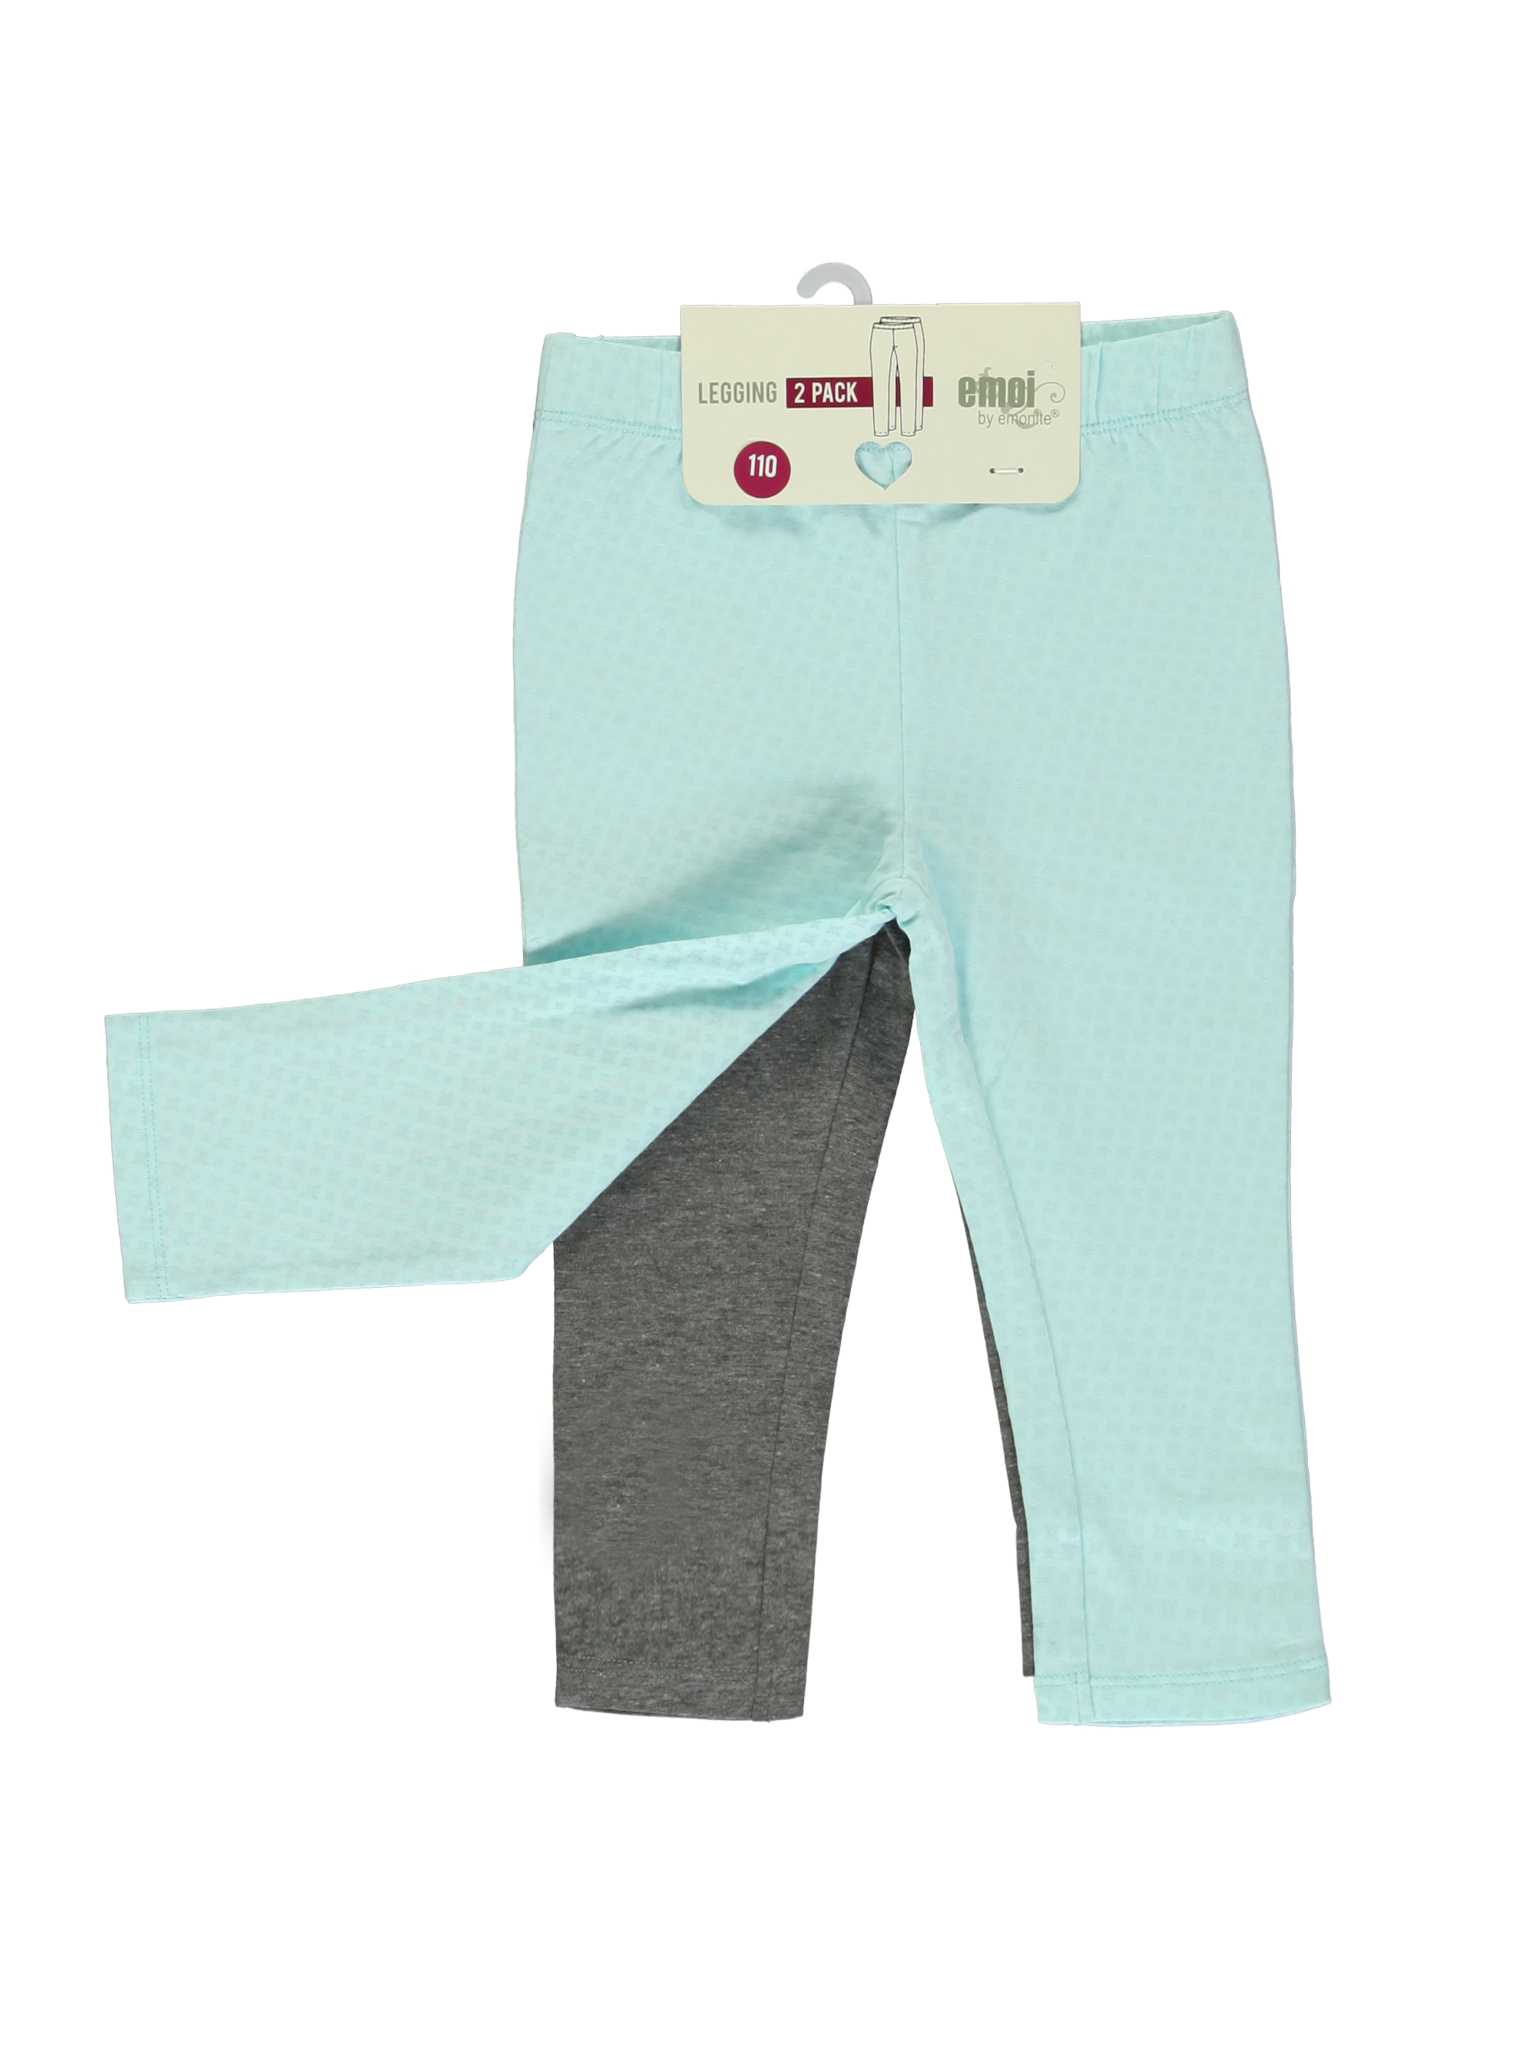 All Brands | Summerproducts Small Girls | Legging | 10 pcs/box